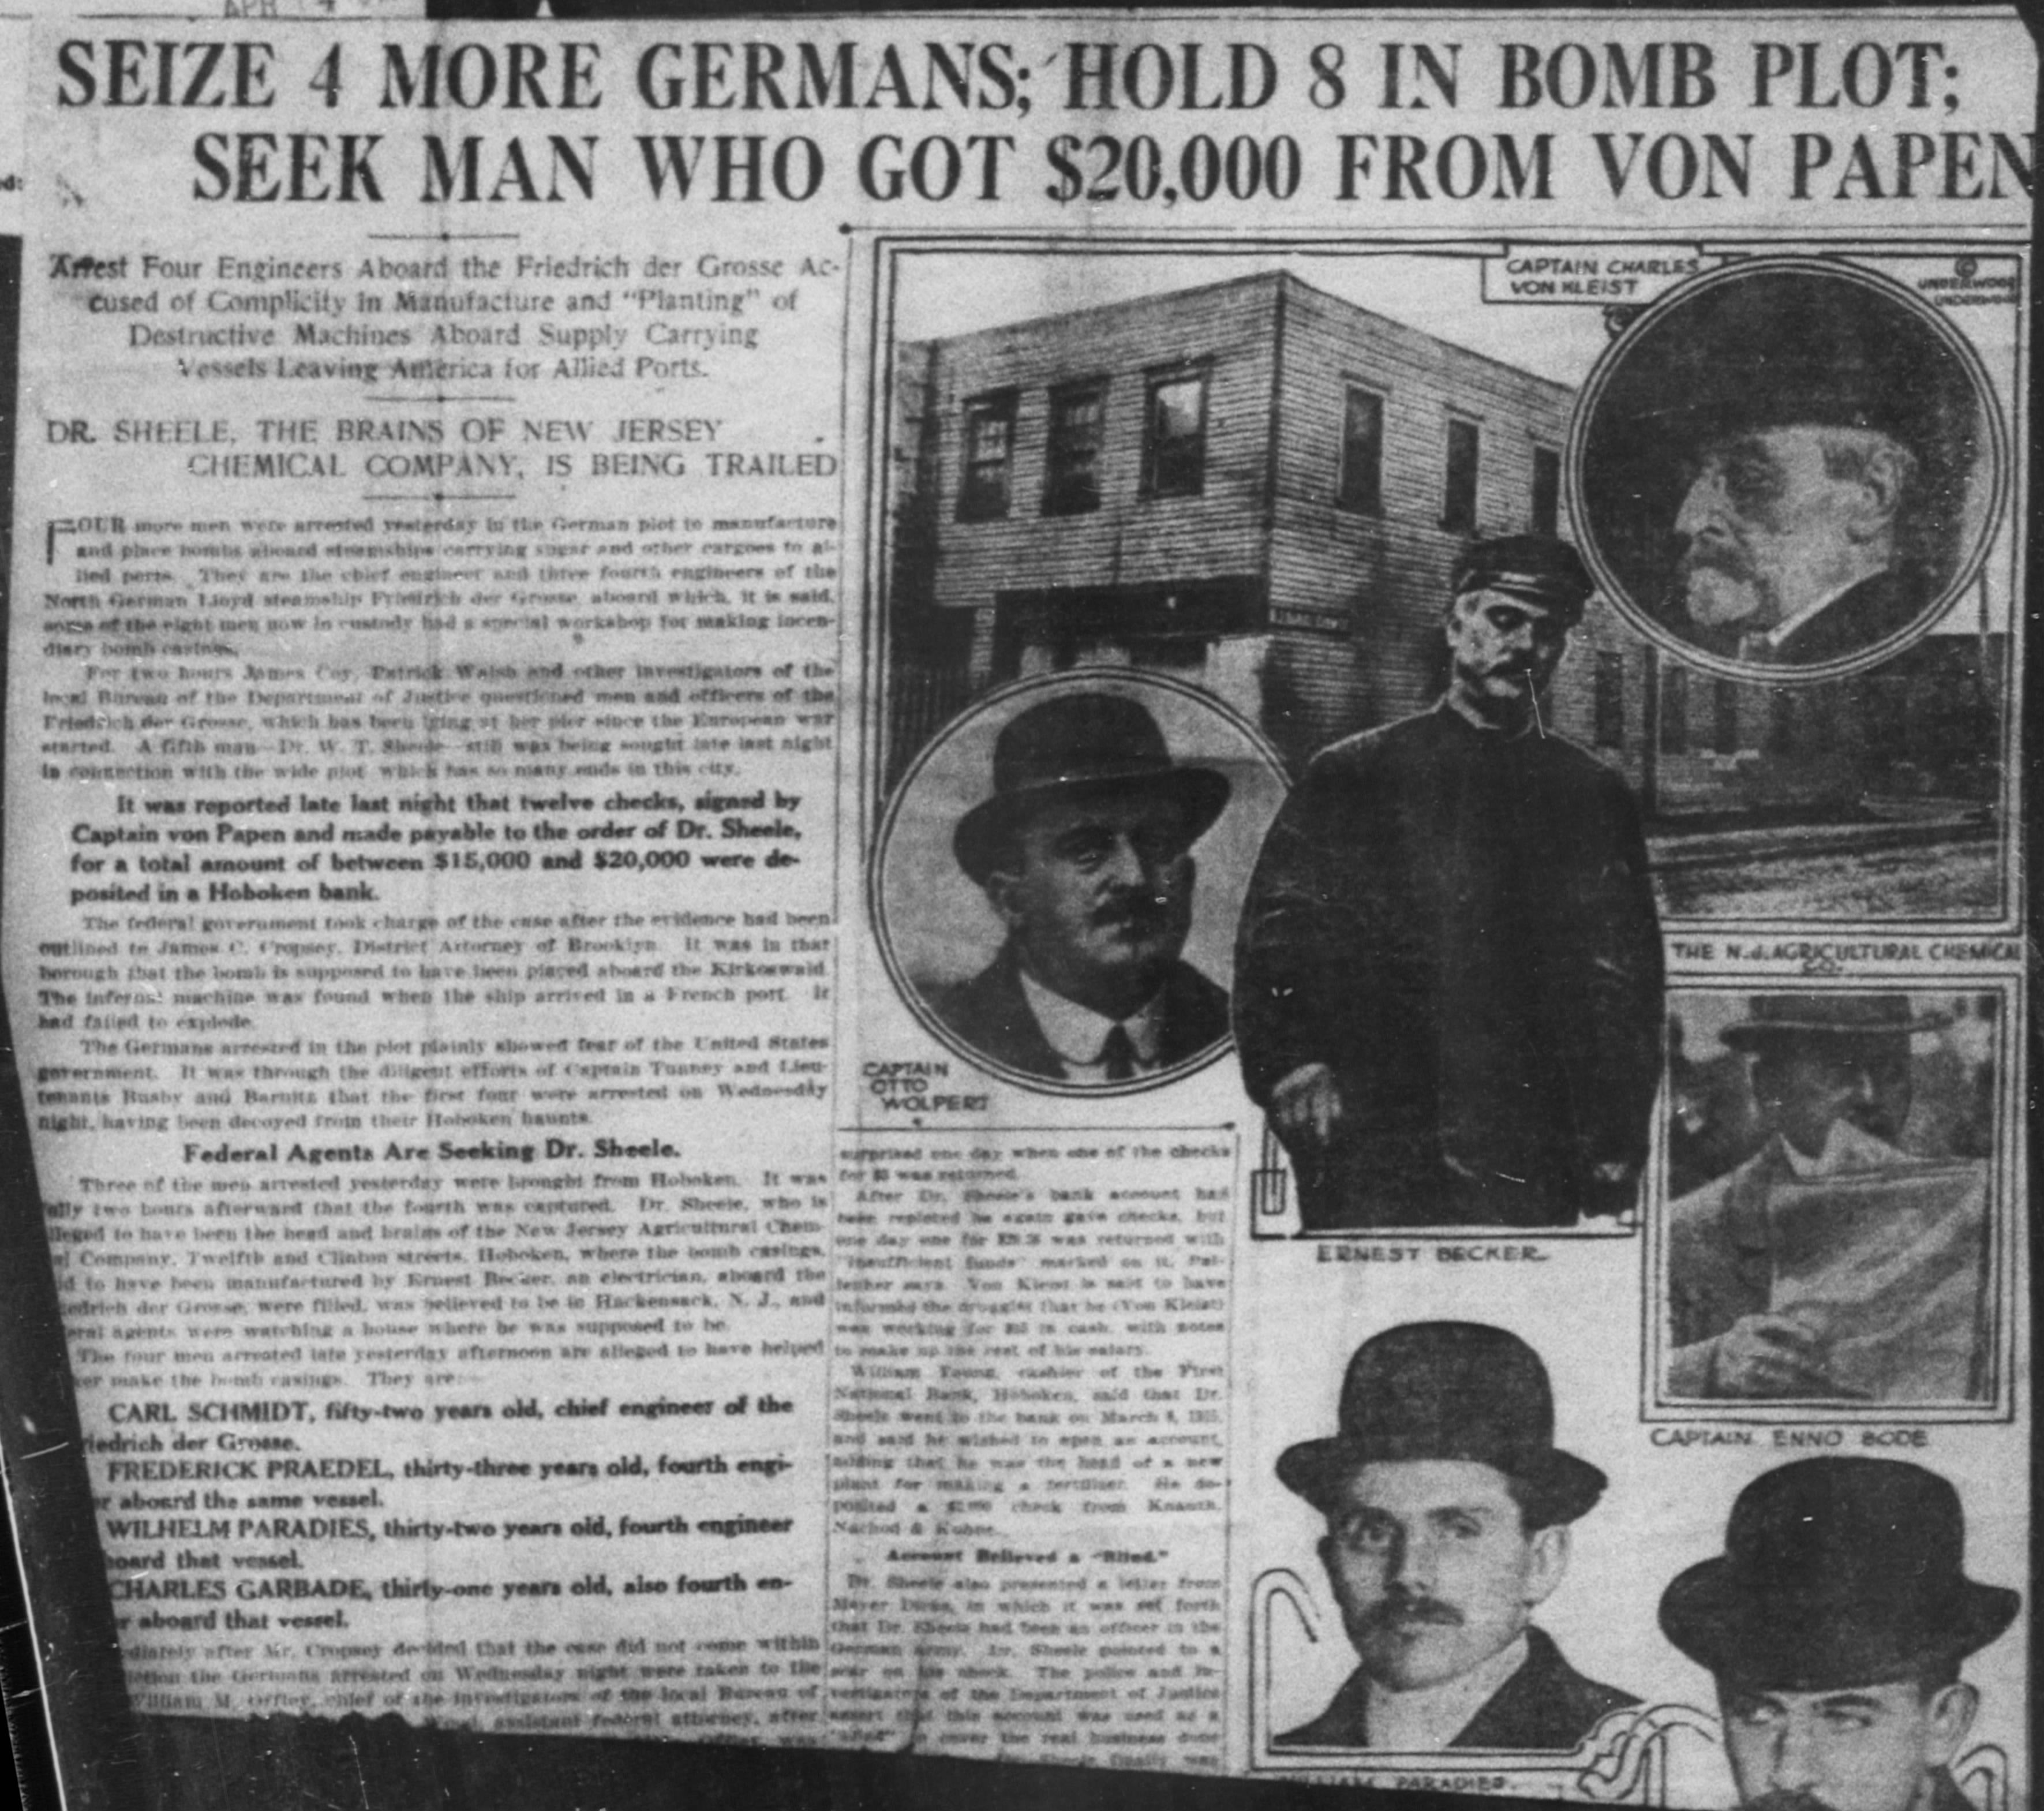 Image result for photo of Walter scheele German spy